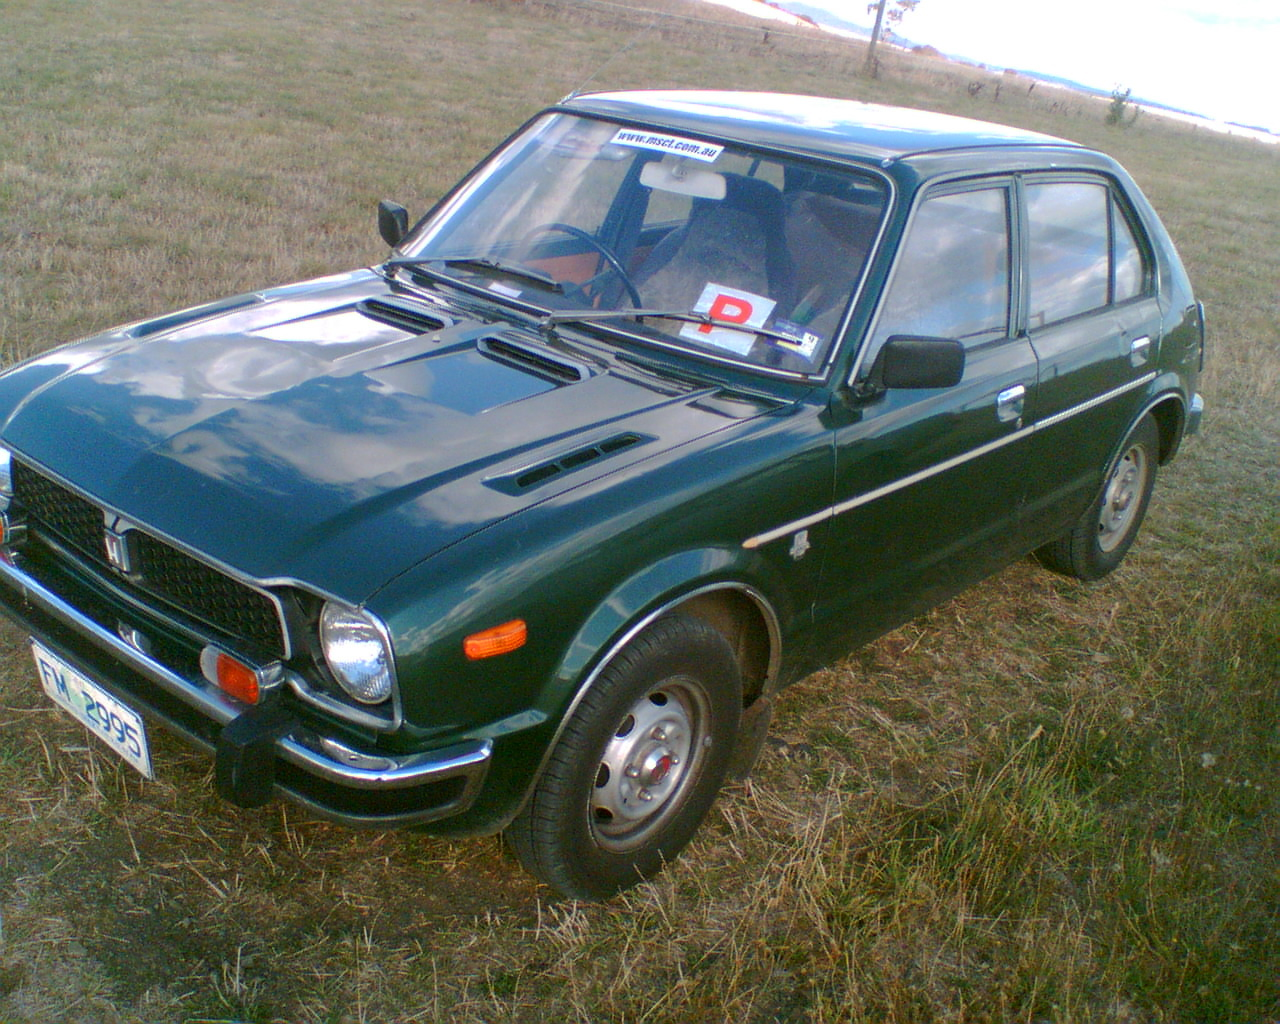 1977 Honda Civic Test Drive Review - CarGurus